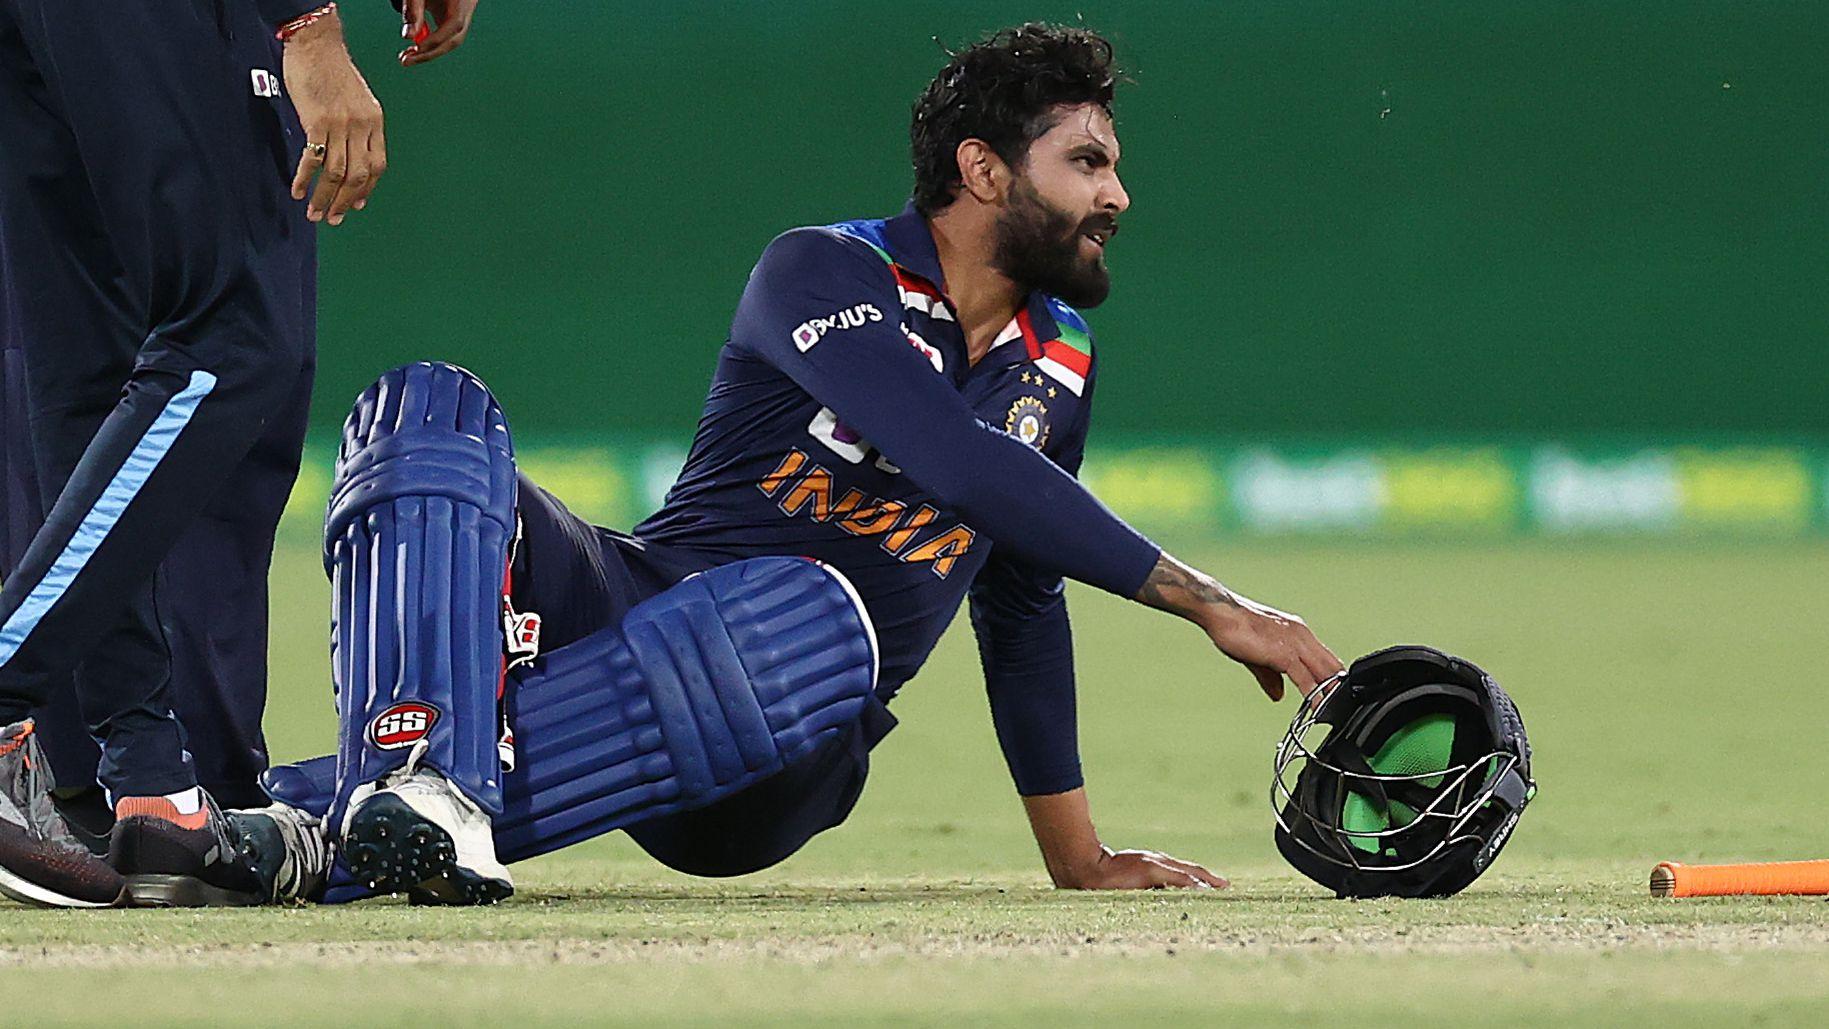 Ravindra Jadeja of India reacts after injuring his leg.